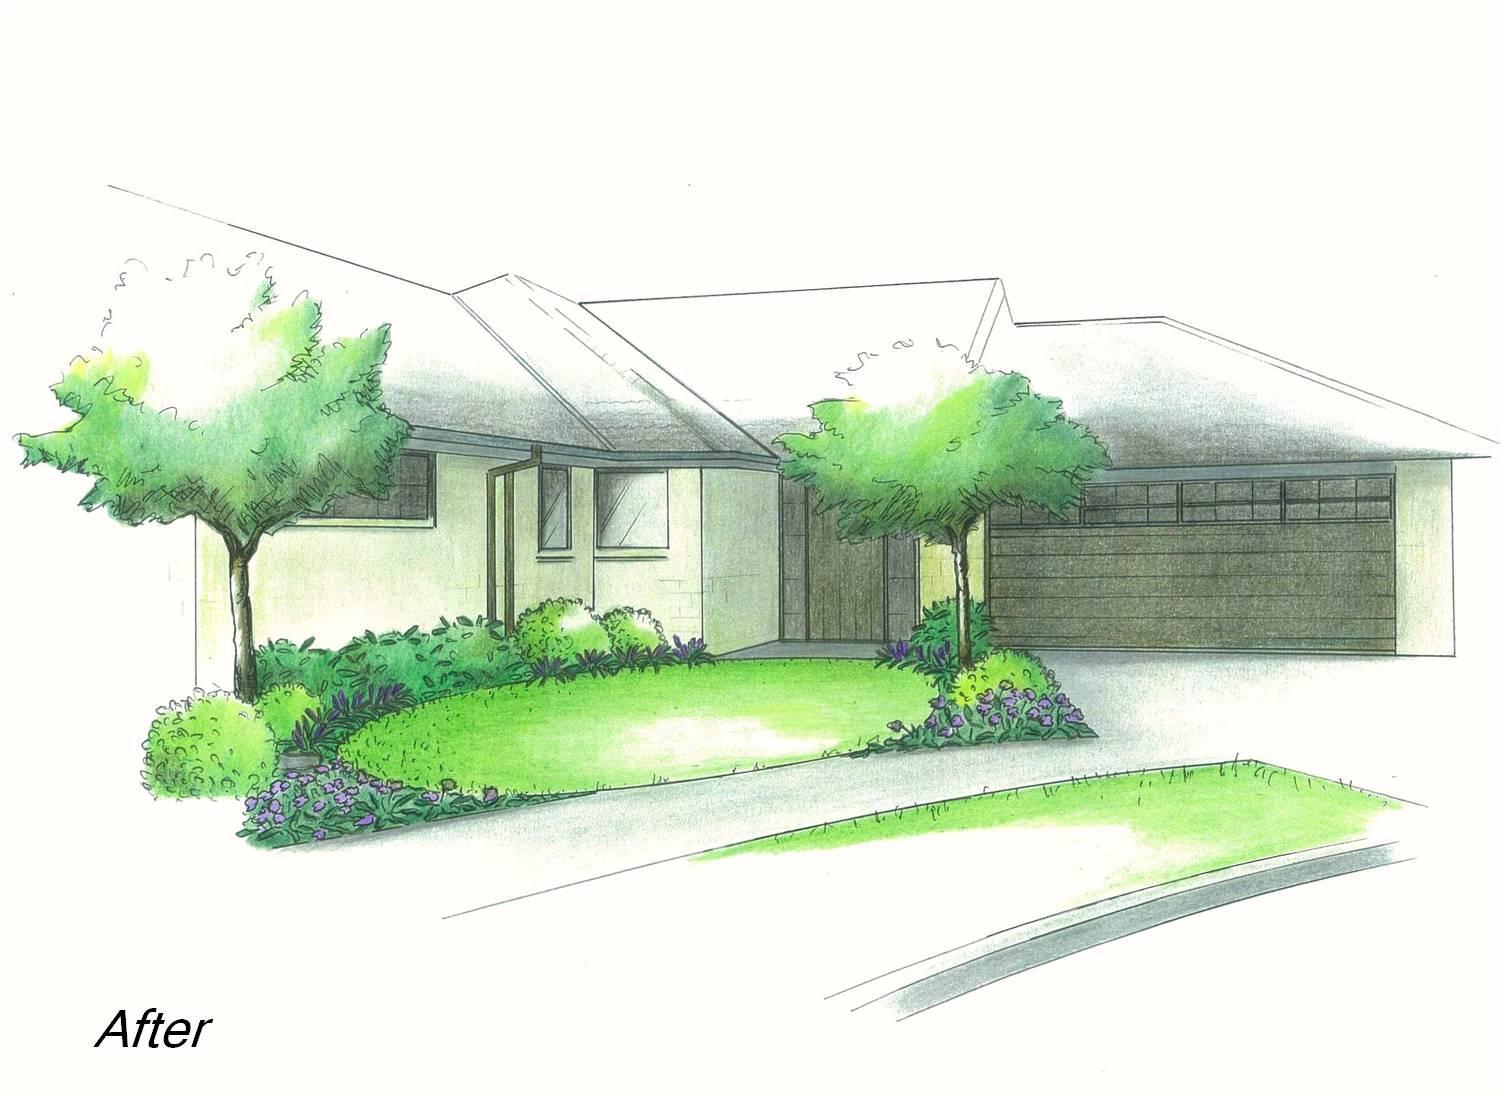 planting-design-for-front-yard